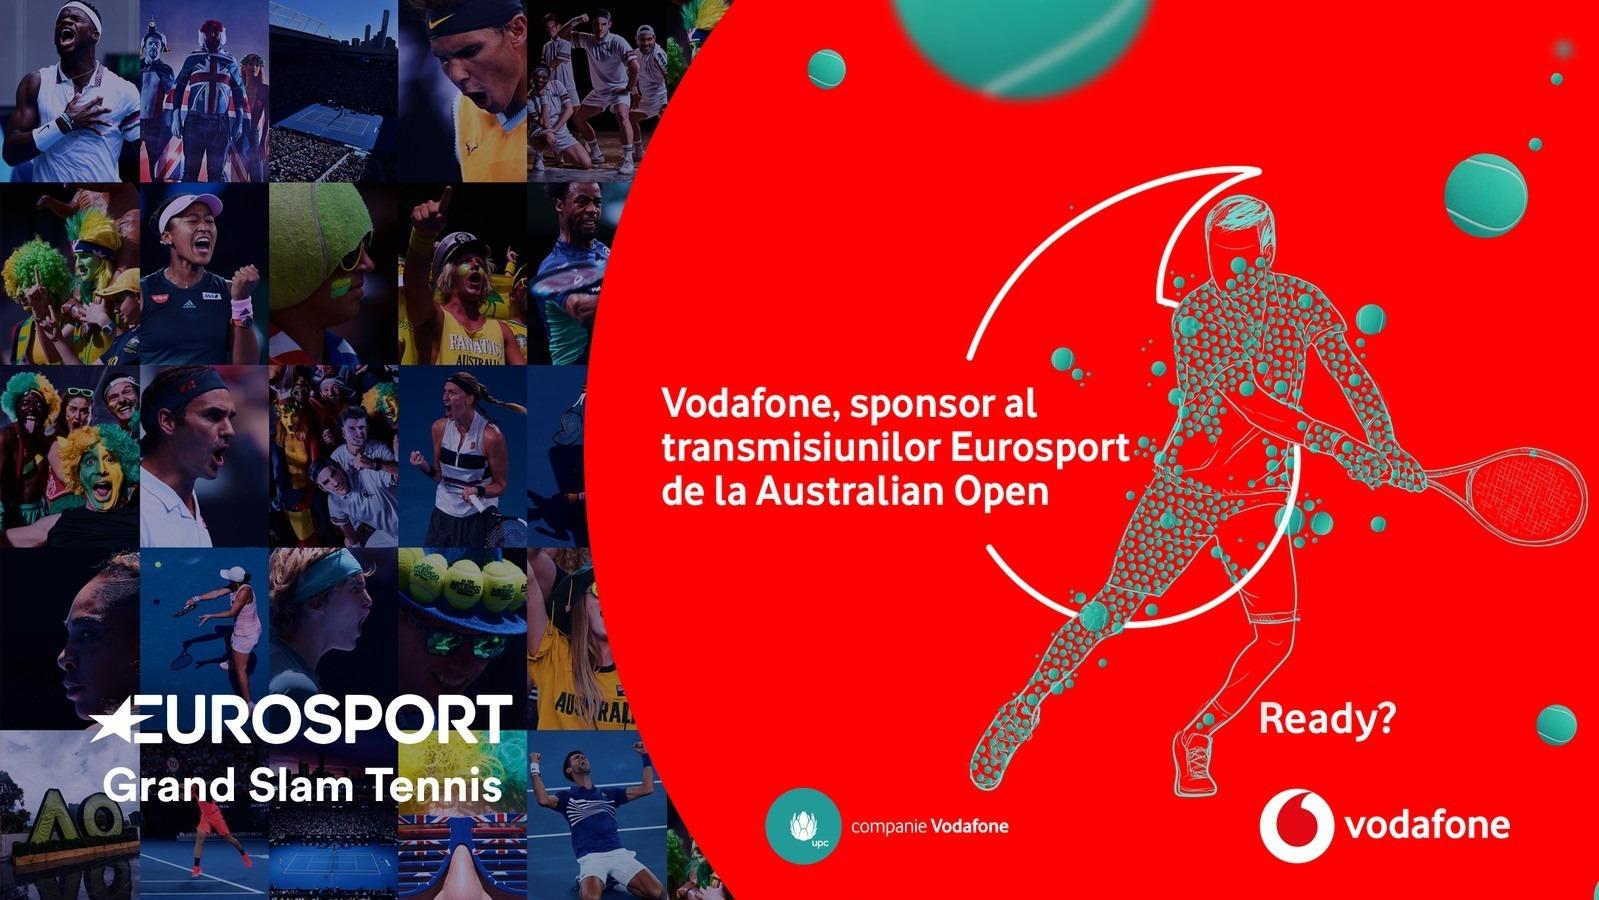 vodafone-eurosport-australian-open